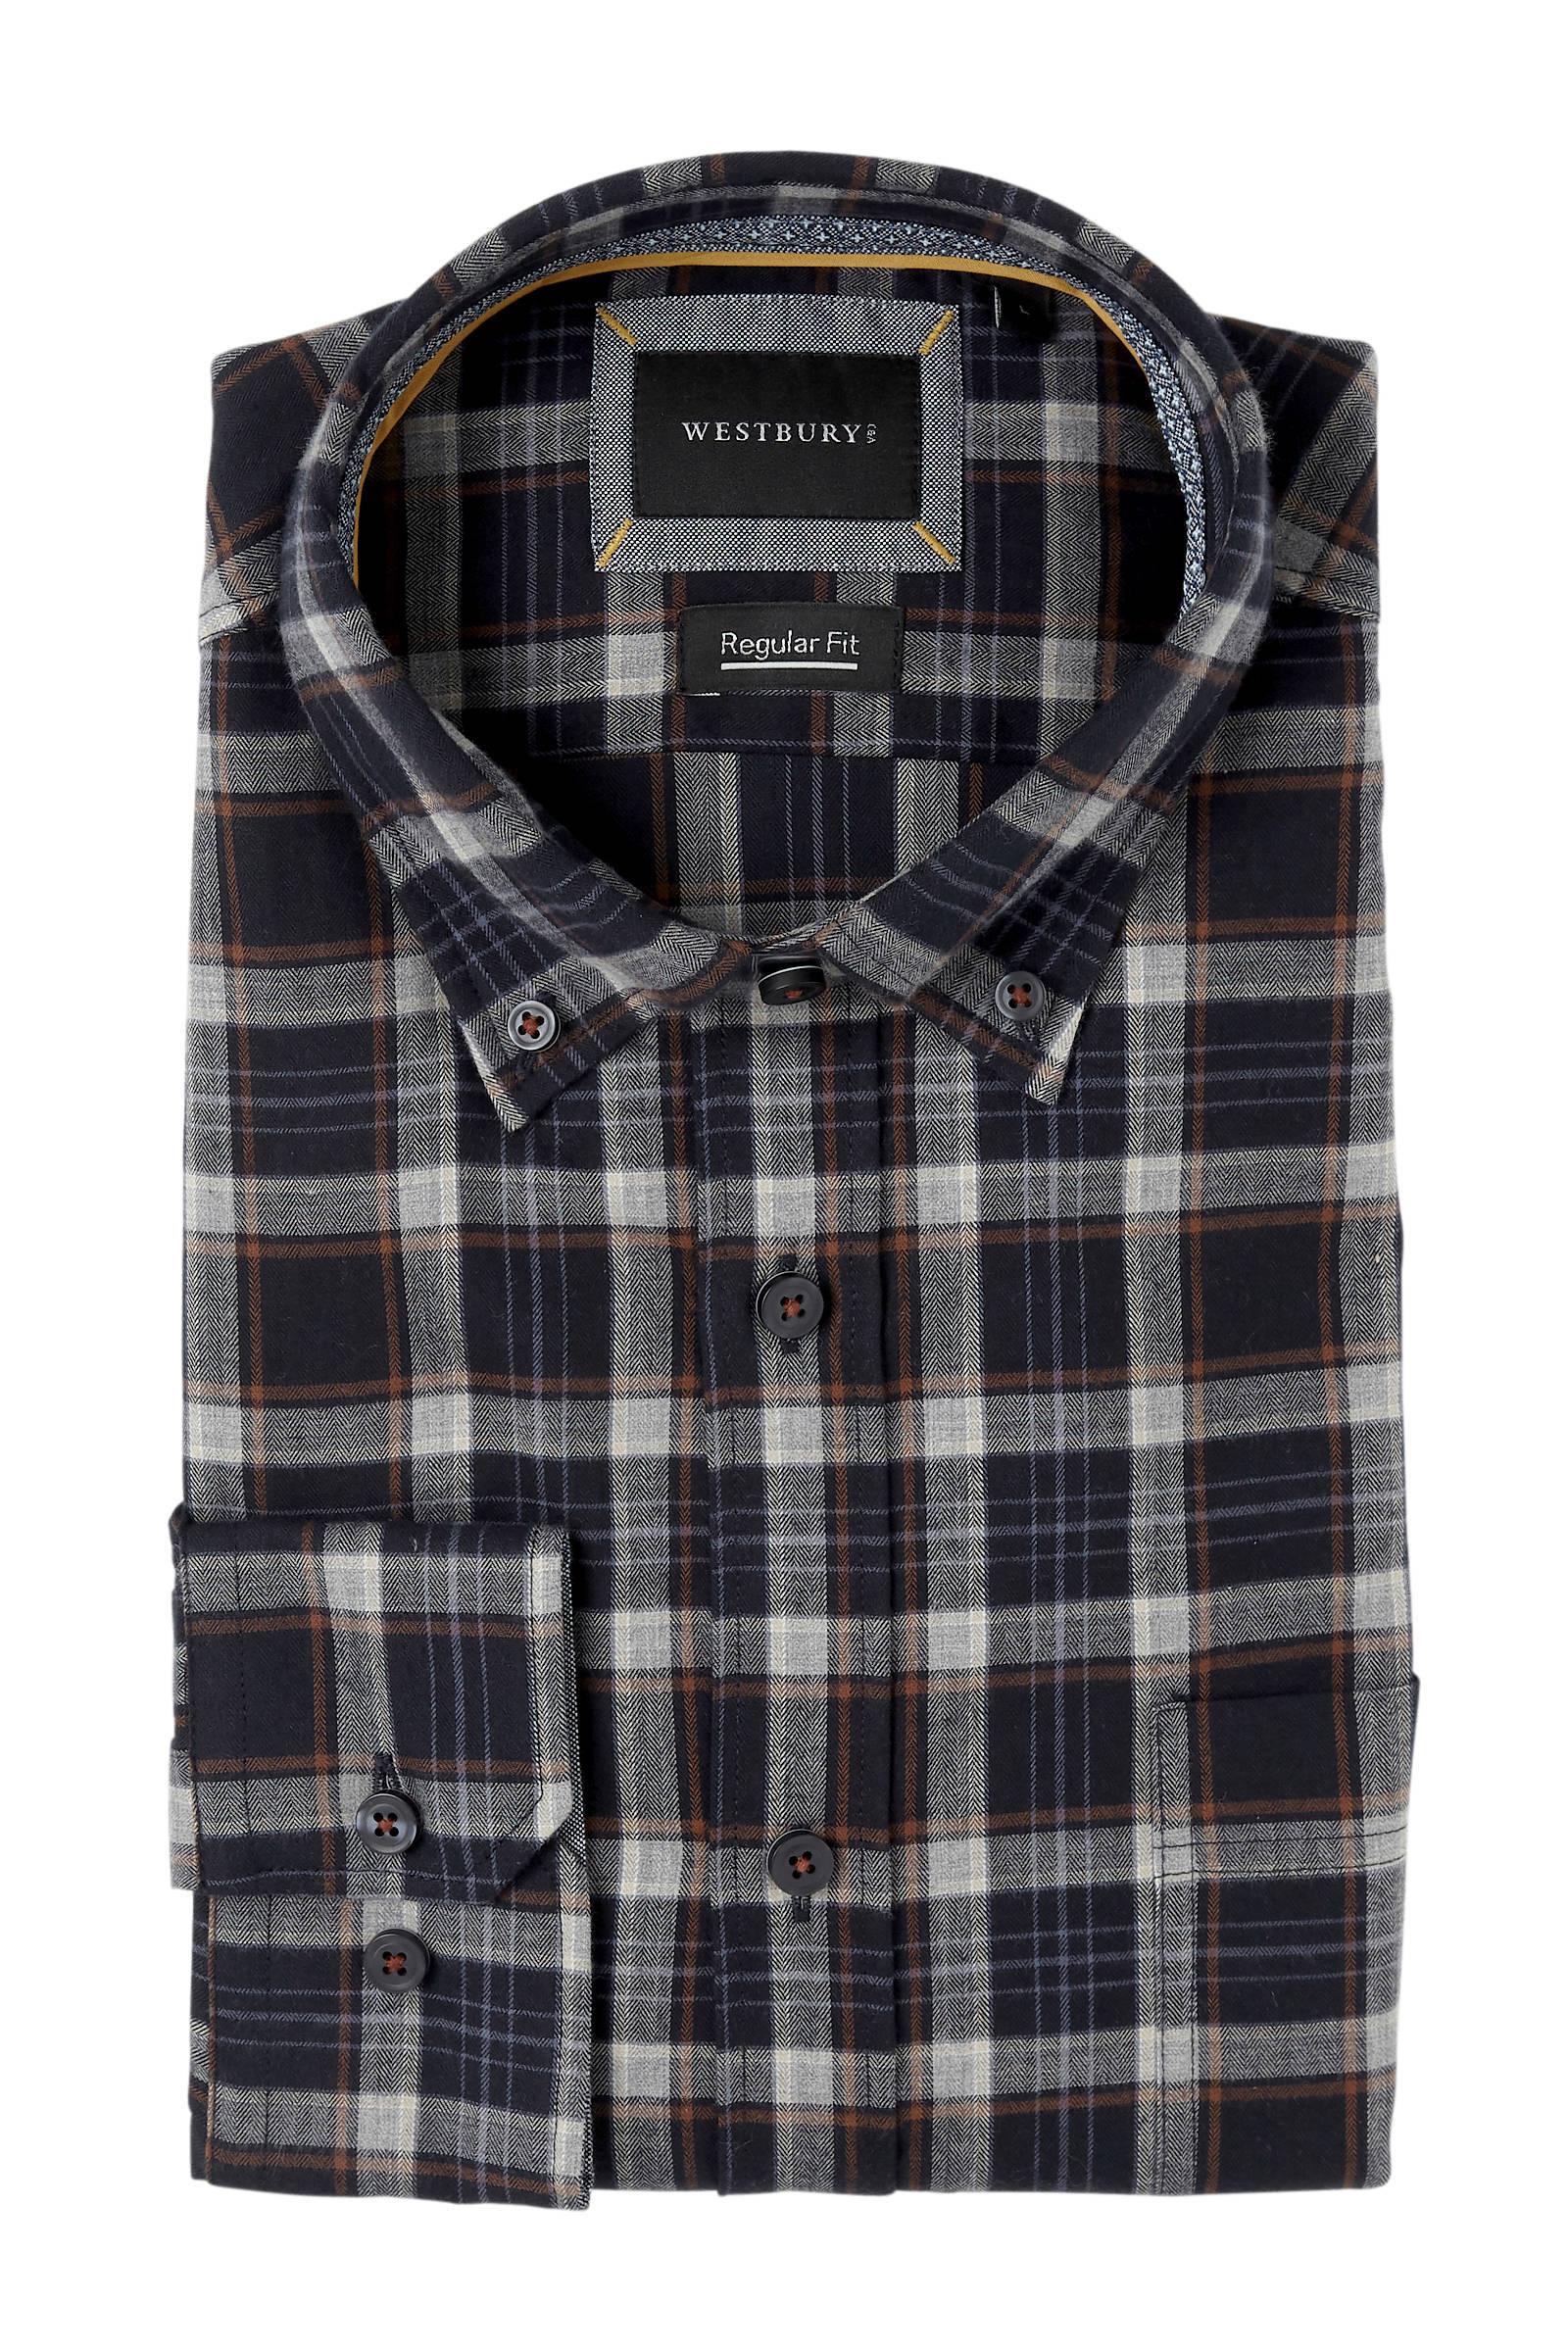 C Westbury Fit Overhemd Slim Geruit BlauwWehkamp amp;a zpUqSMGVL